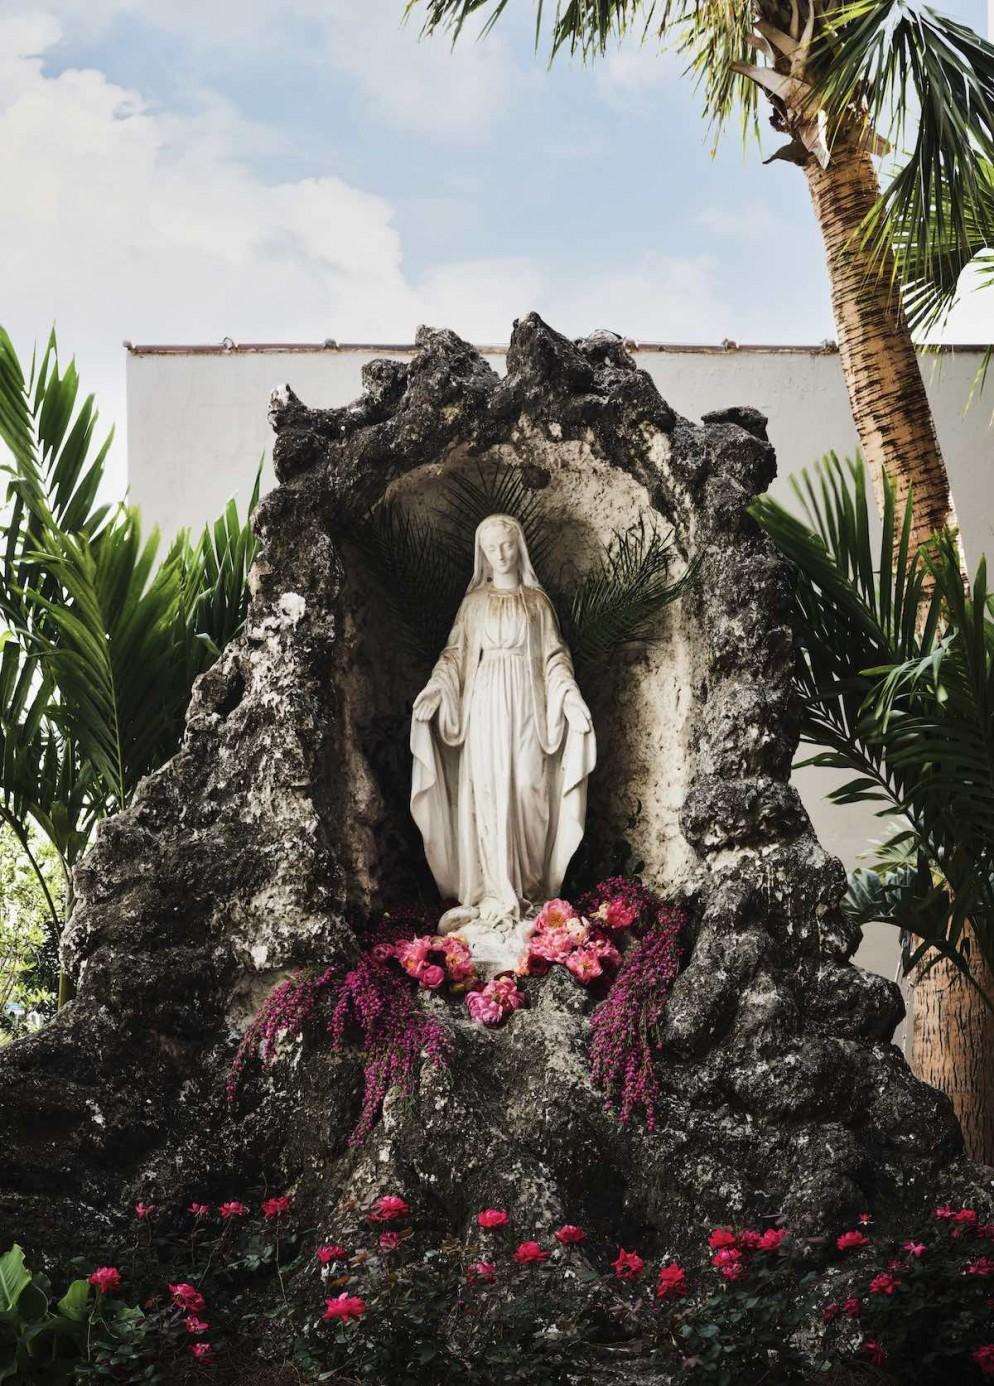 Hotel Saint Vincent - Courtyard x Statue - by Douglas Friedman